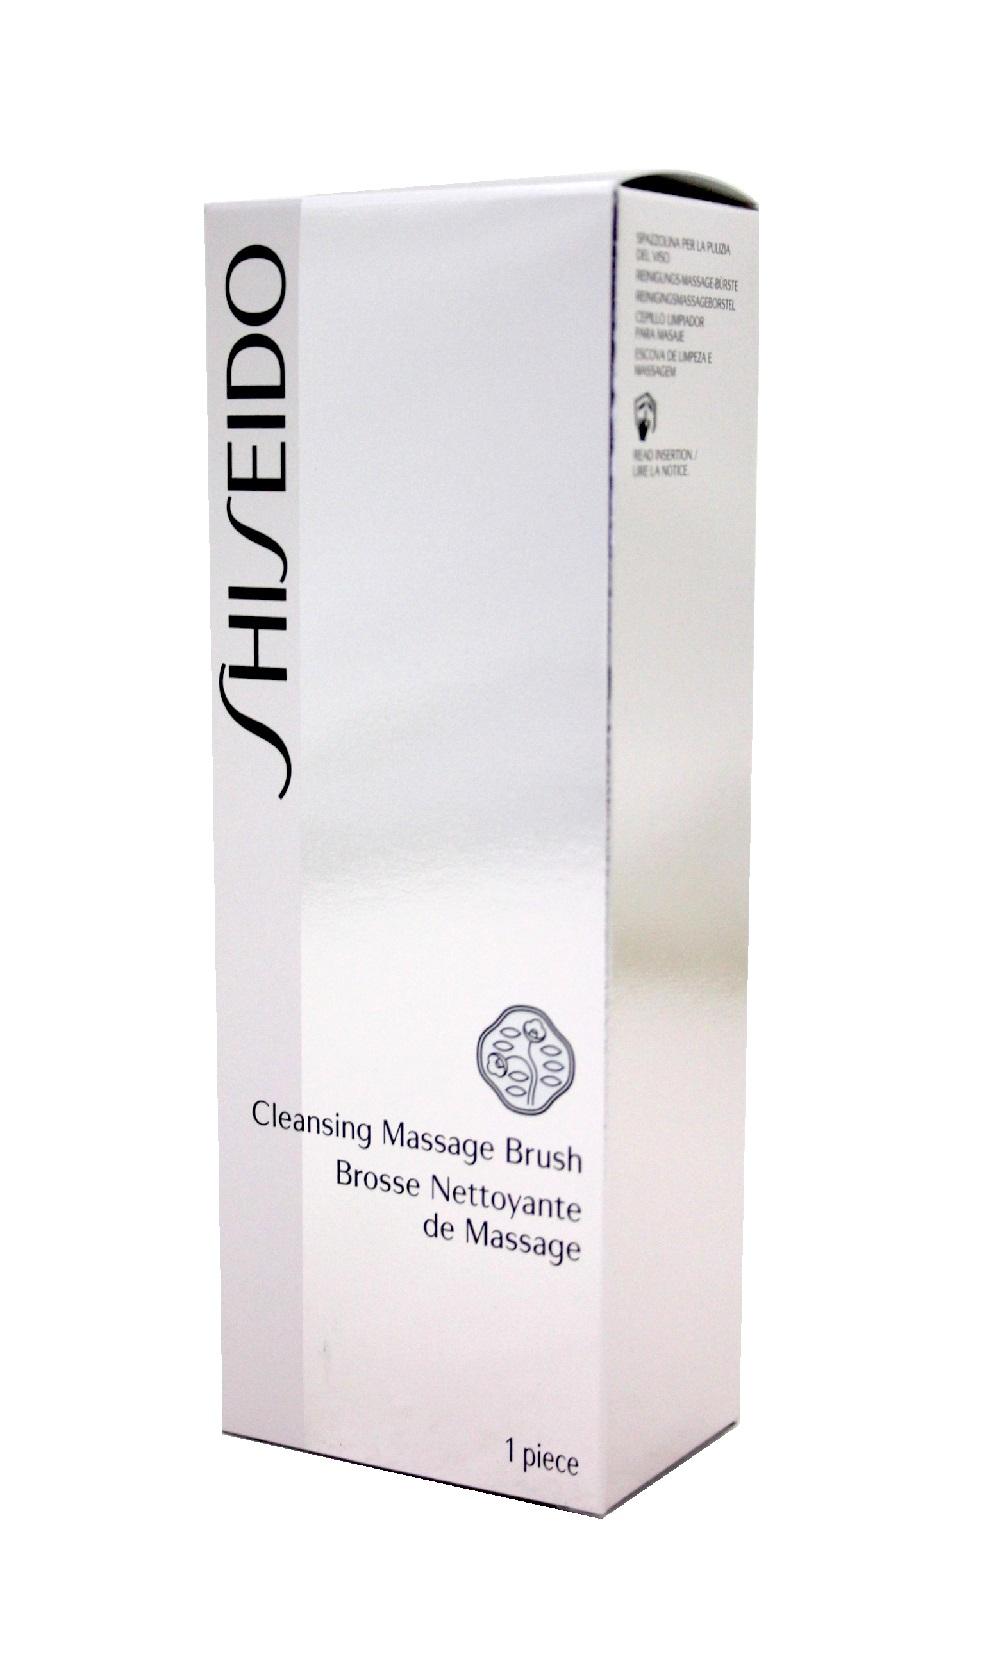 Shiseido Cleansing Massage Brush